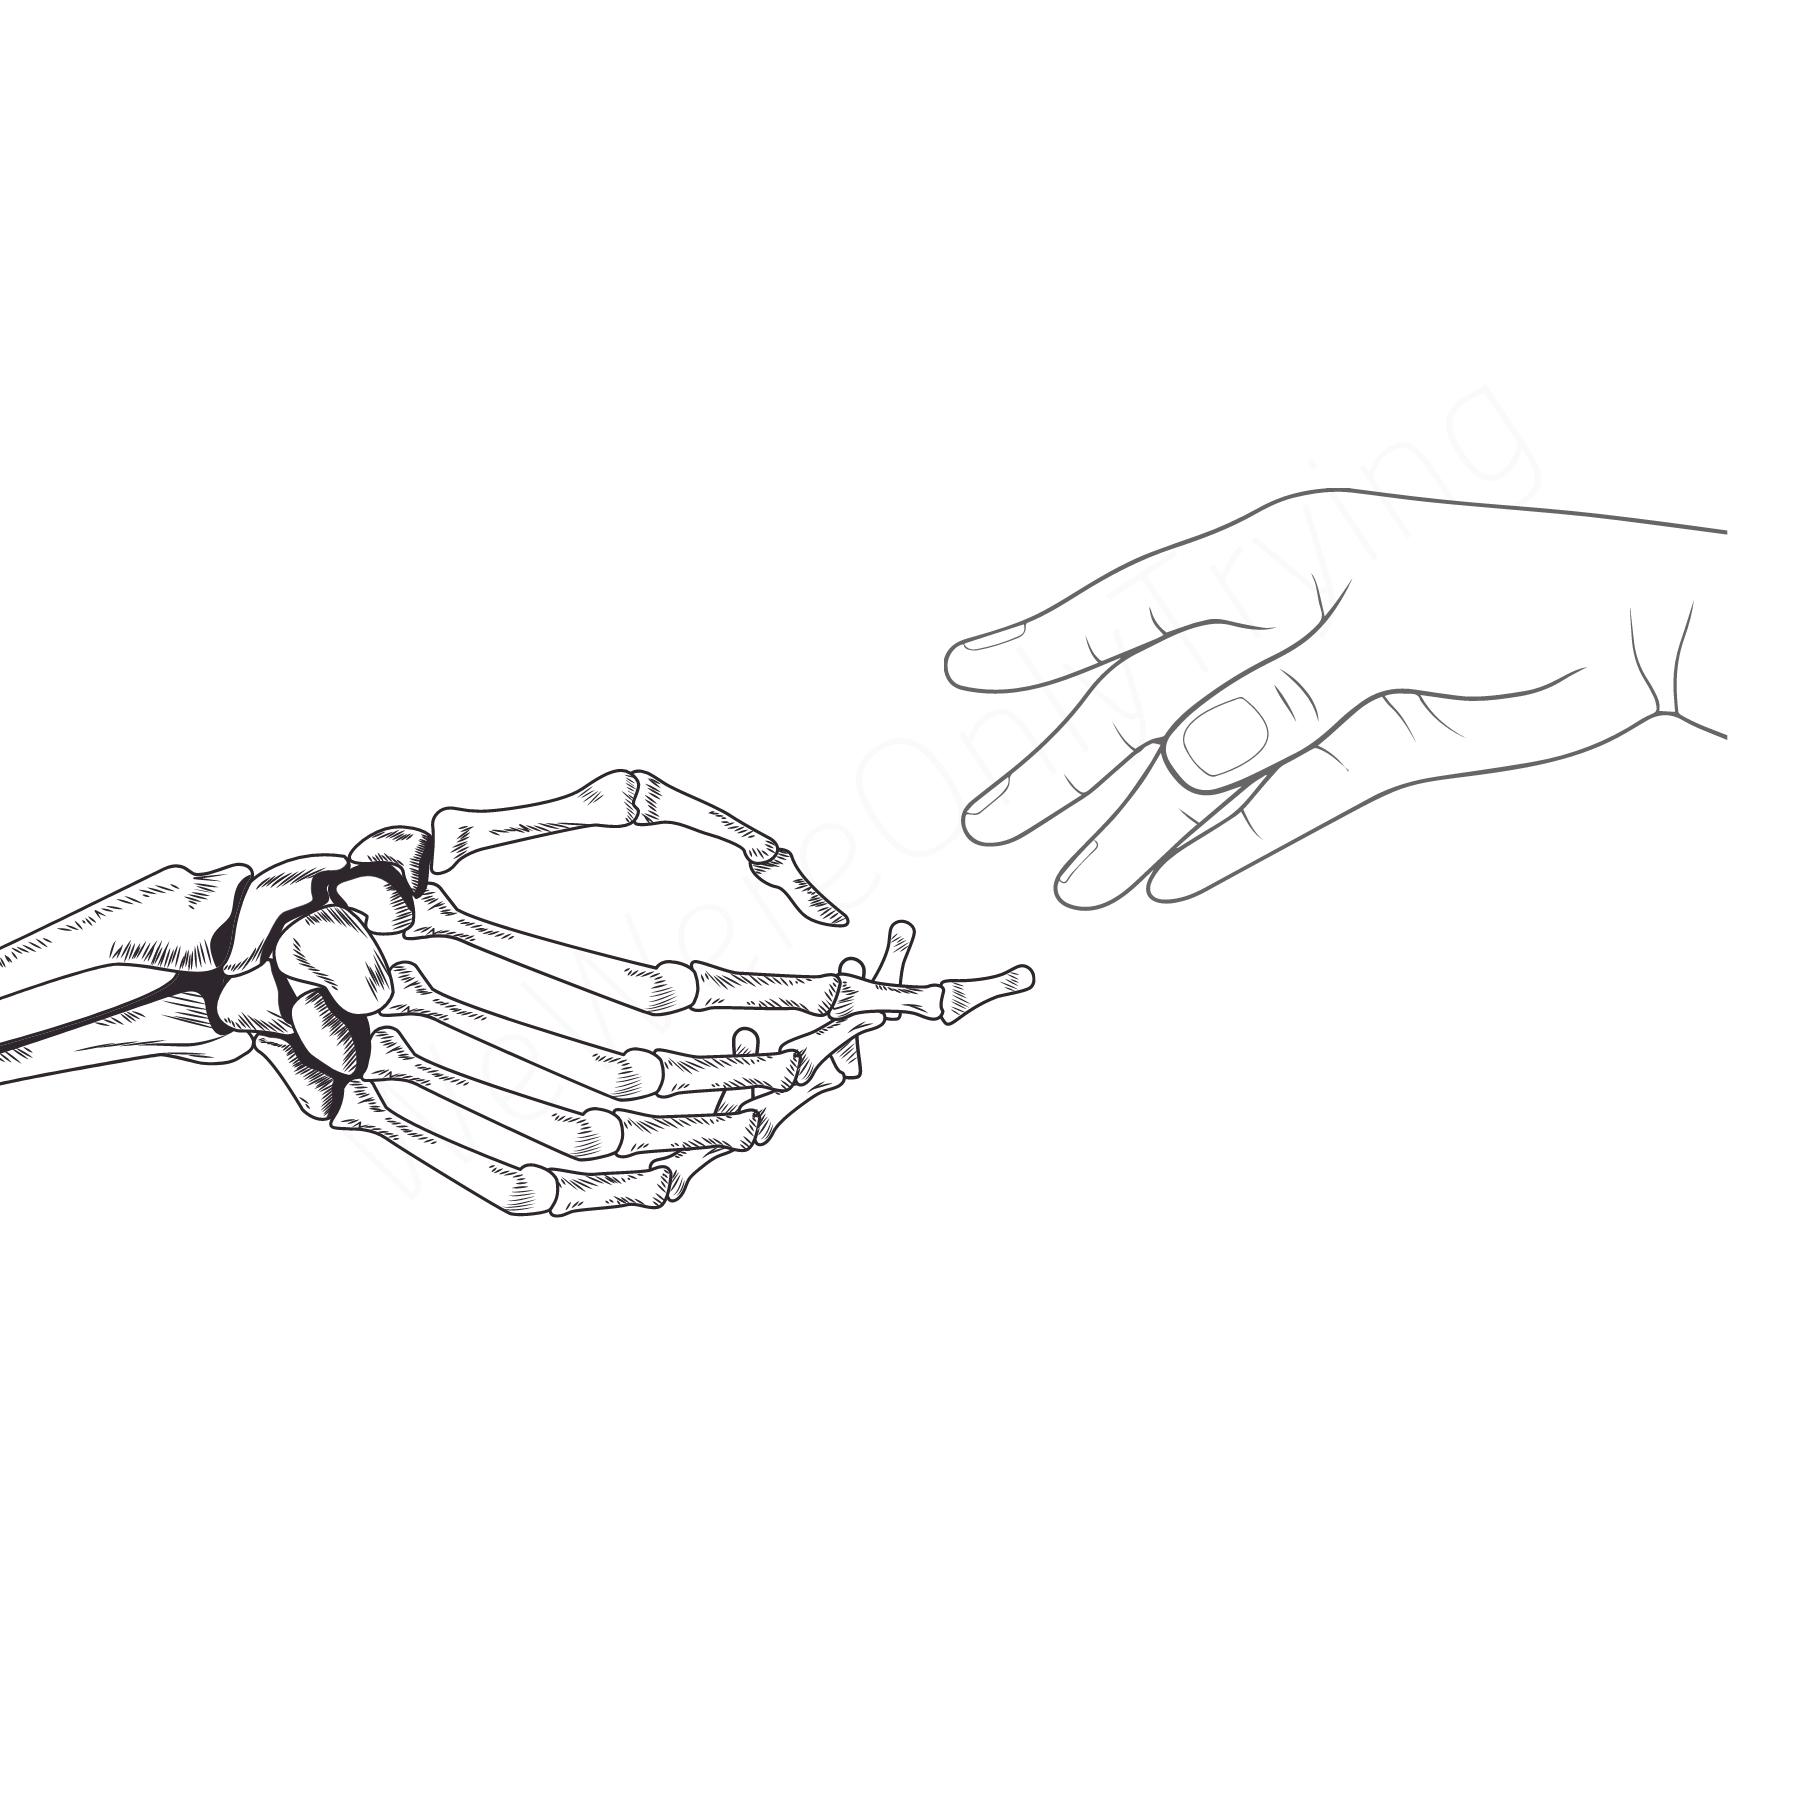 Skeleton Hand Wall Art Print Printable Etsy In 2021 Skeleton Hands Drawing Black And White Aesthetic Black And White Drawing